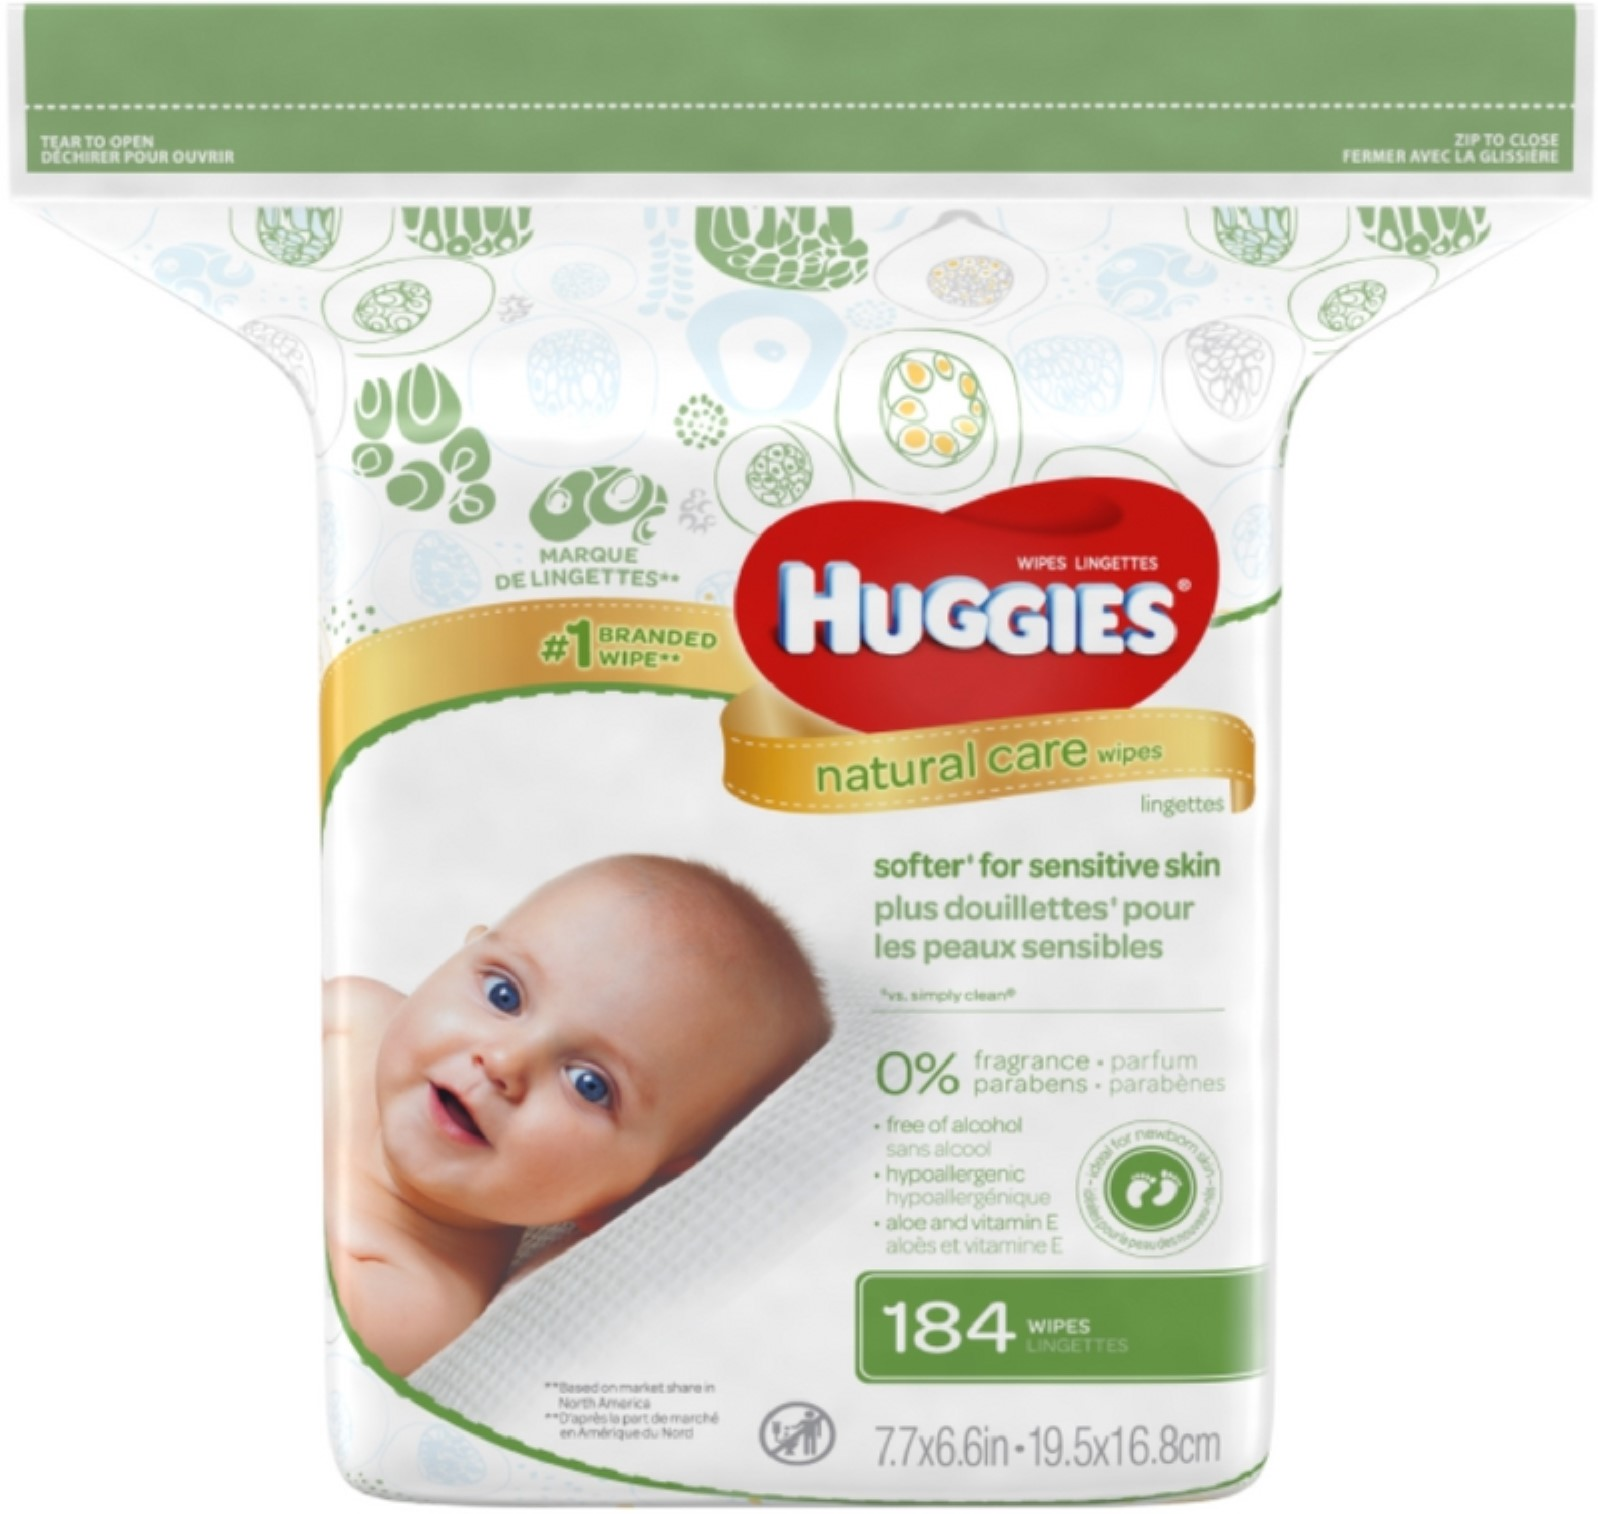 6 Pack Huggies Natural Care Fragrance-Free Wipes 184 ea by HUGGIES